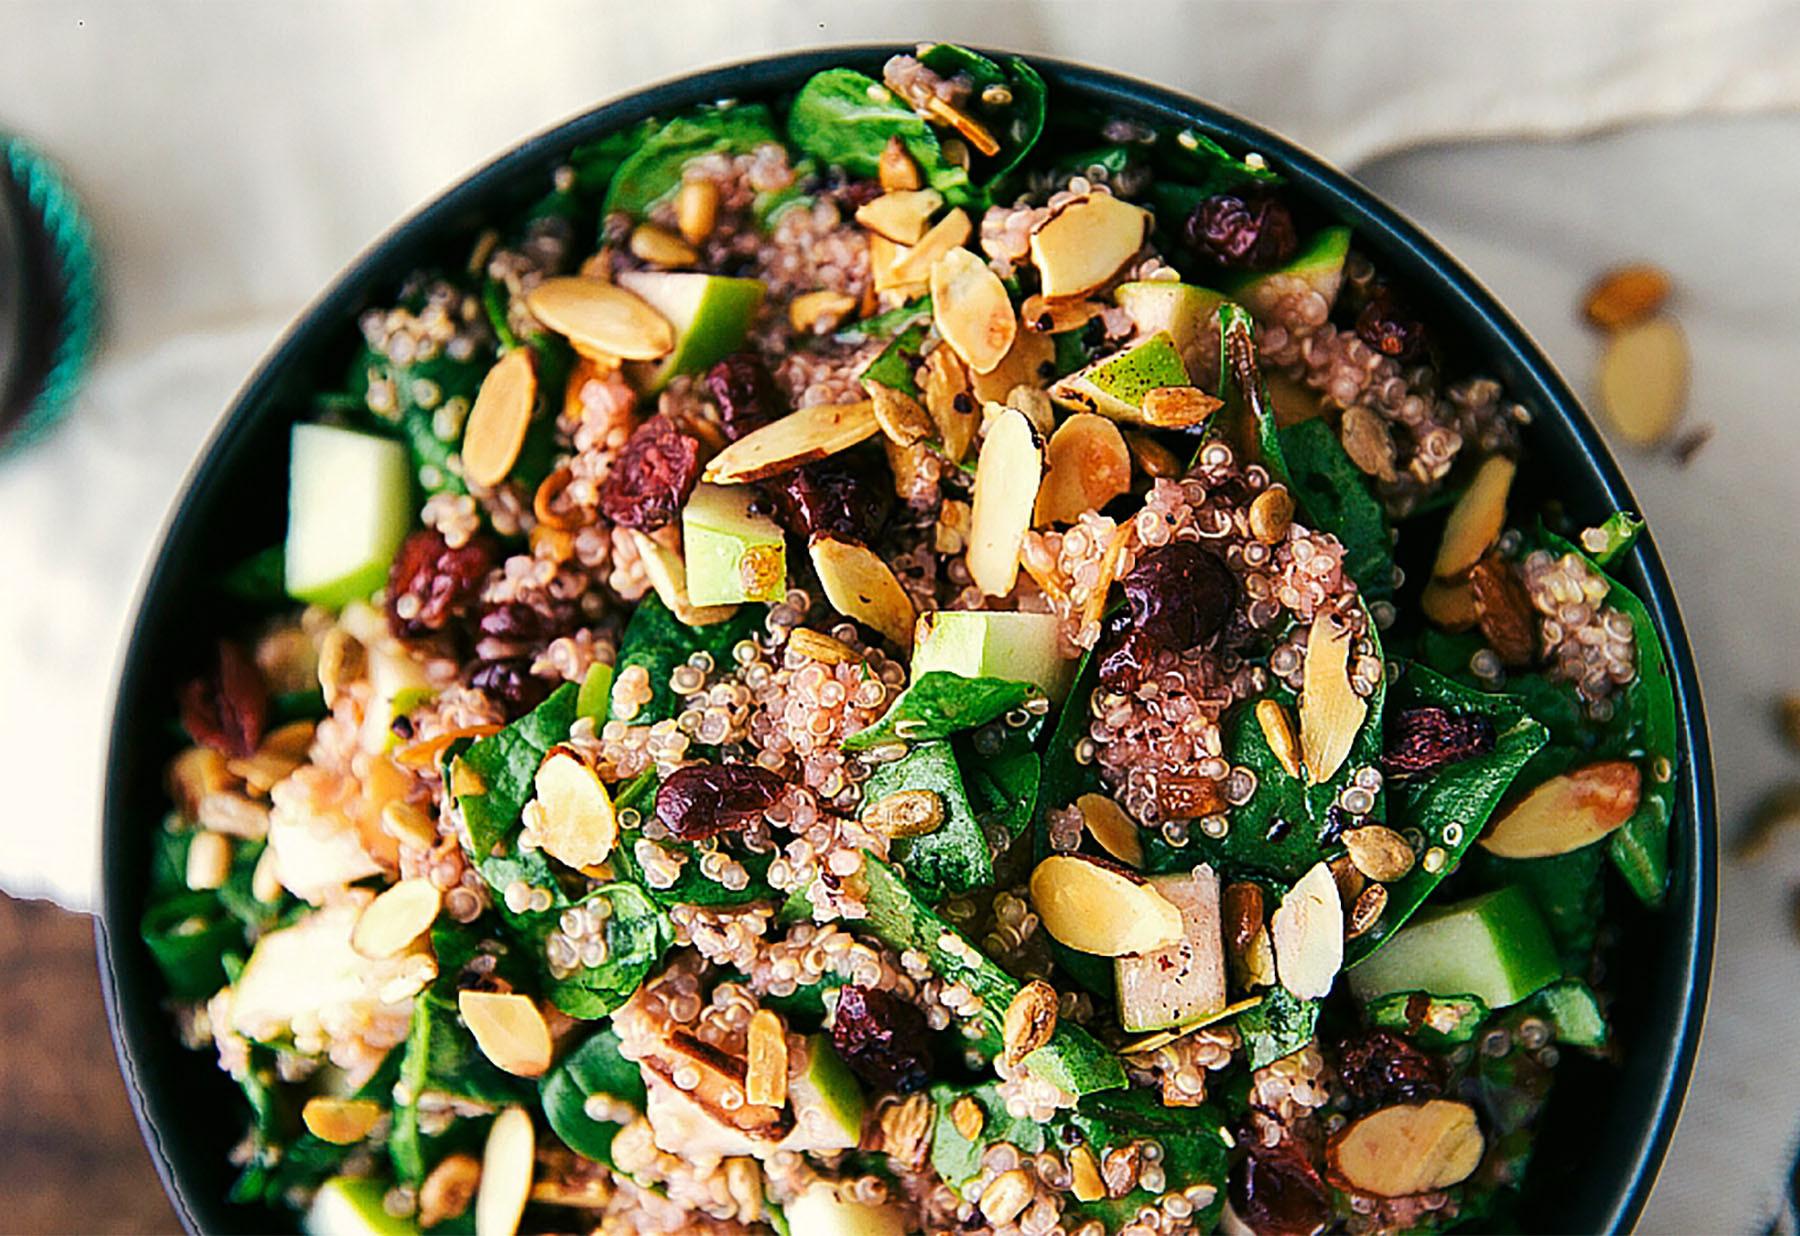 Healthy Fall Salads  SALAD 3 WAYS TO START AND KEEP EATING SALAD NTOI